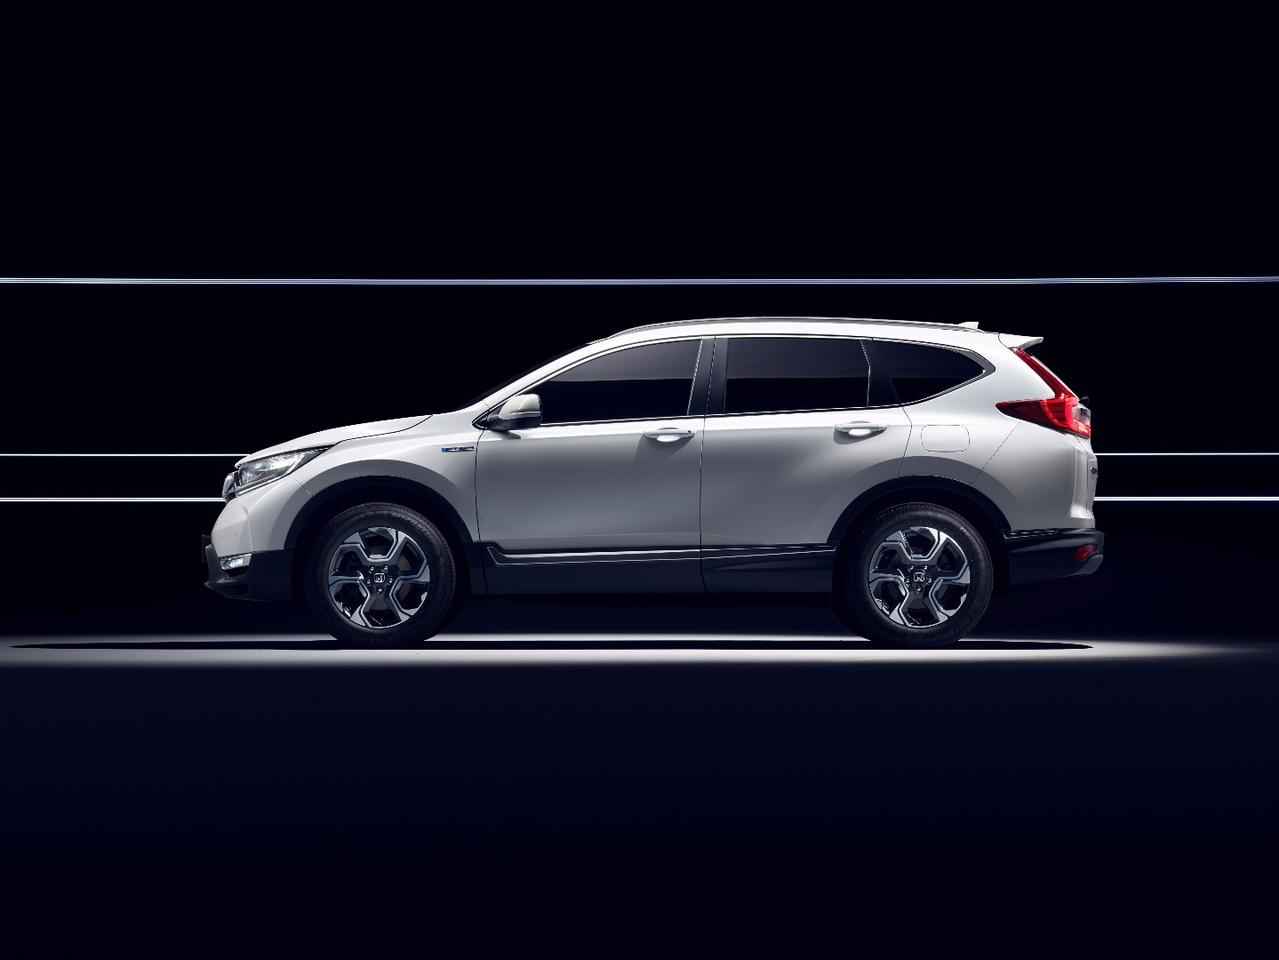 The new Honda CR-VHybrid prototype